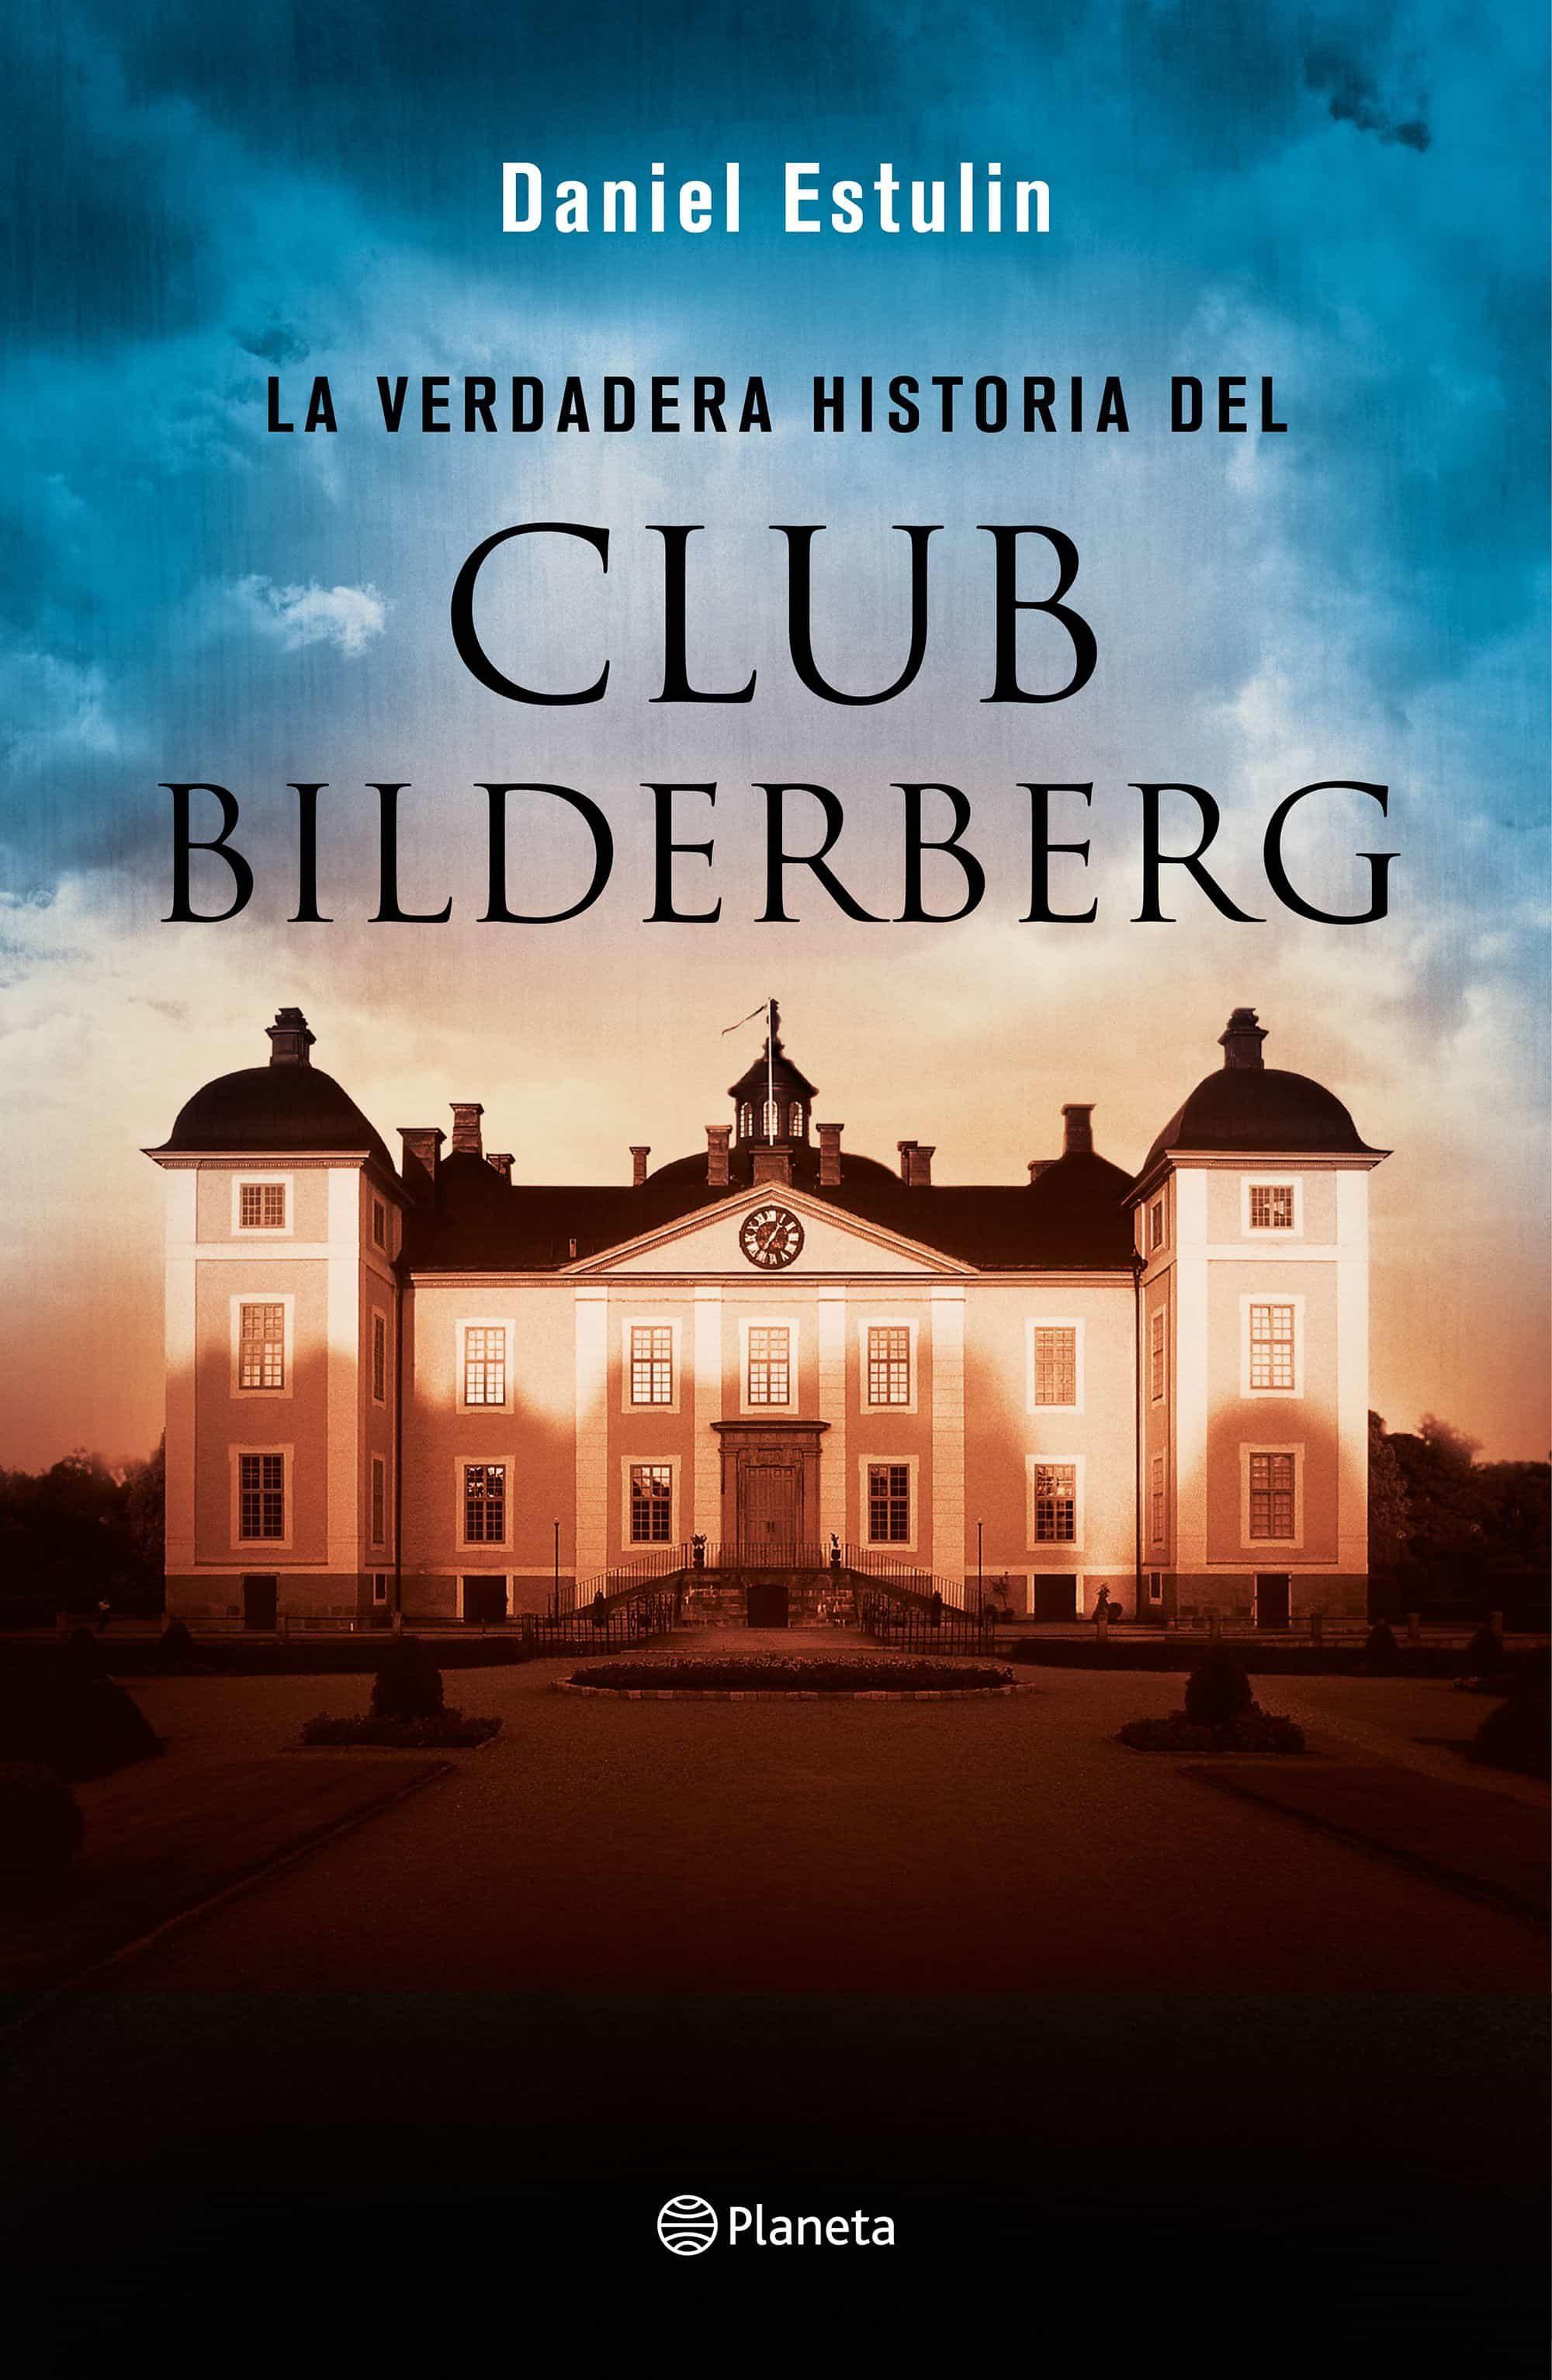 La Verdadera Historia Del Club Bilderberg por Daniel Estulin